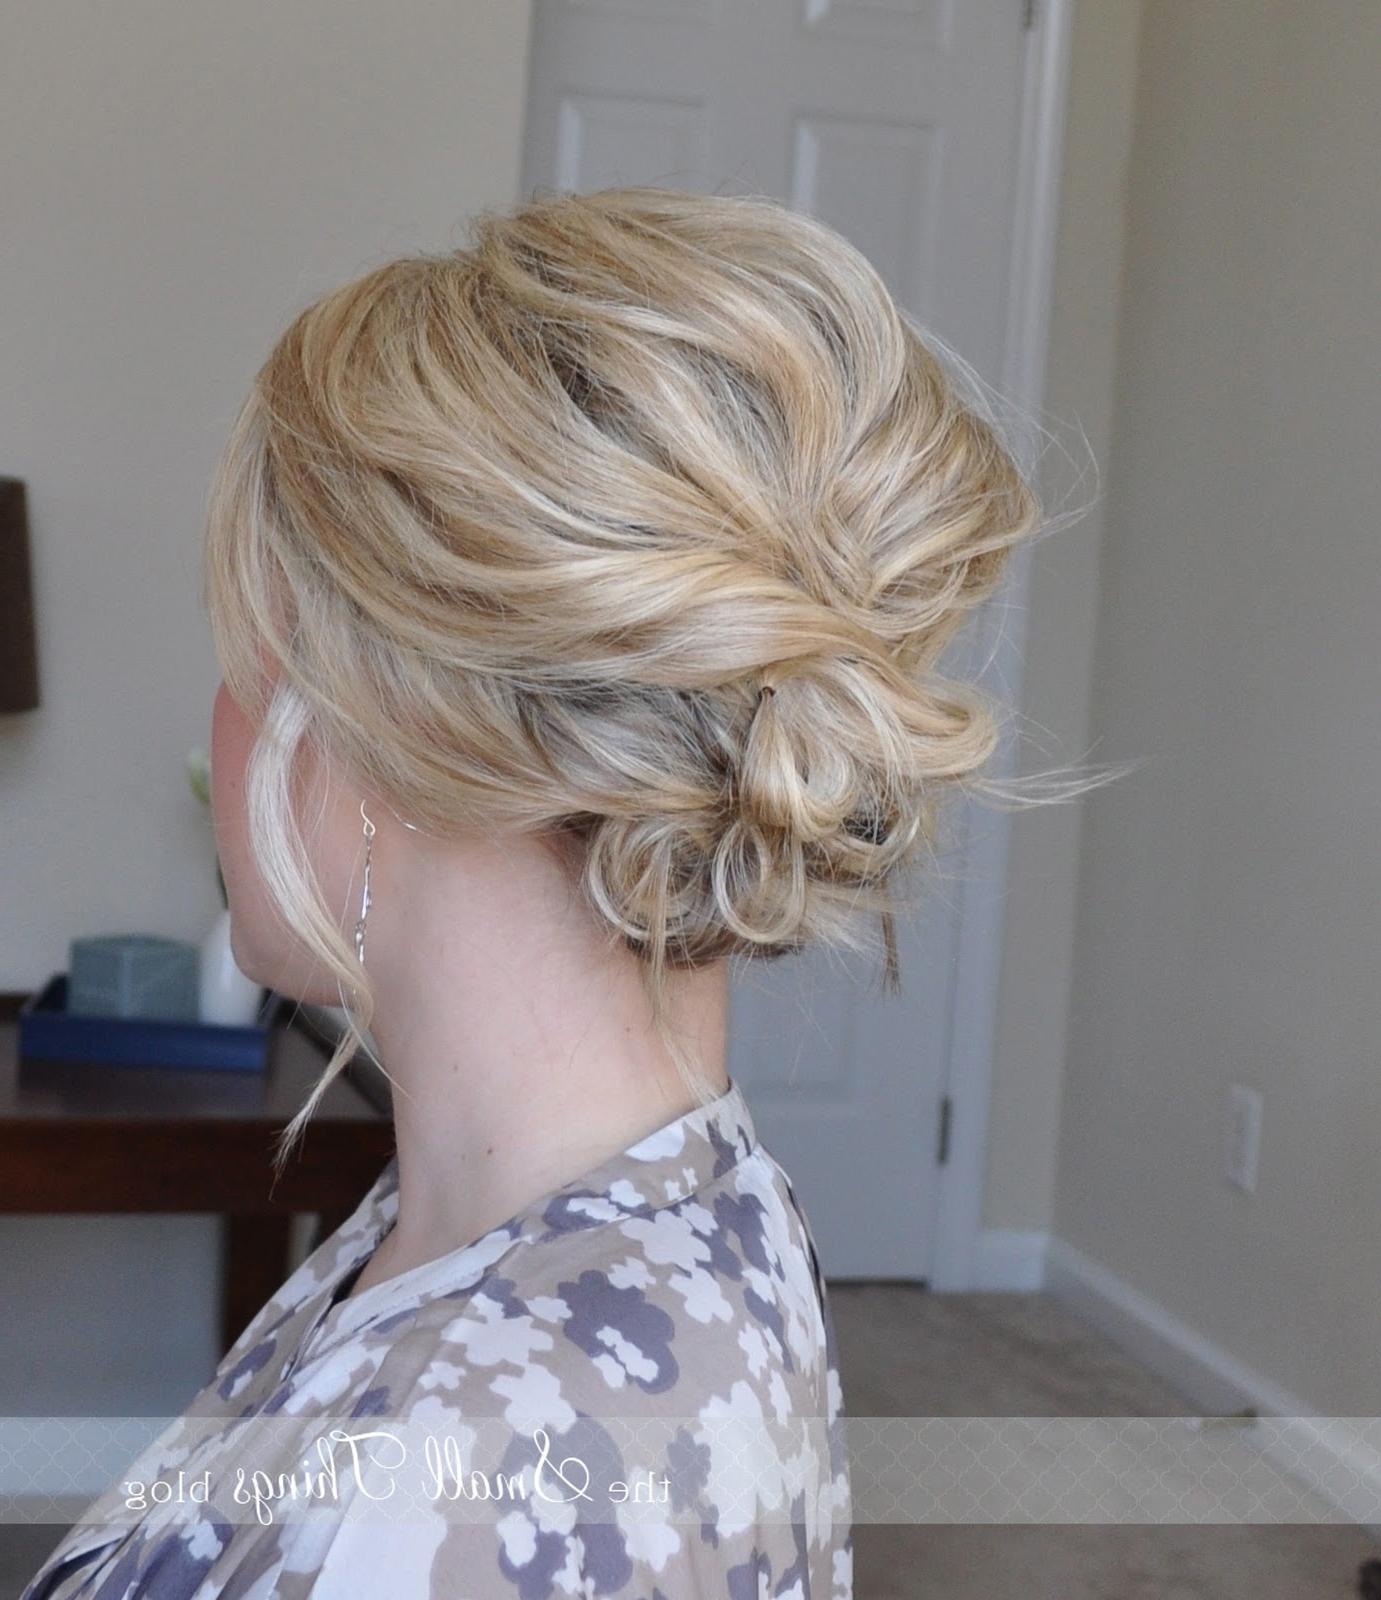 Beach Wedding Hairstyles For Medium Length Hair – Hairstyle For With Messy Updo Hairstyles For Wedding (View 13 of 15)